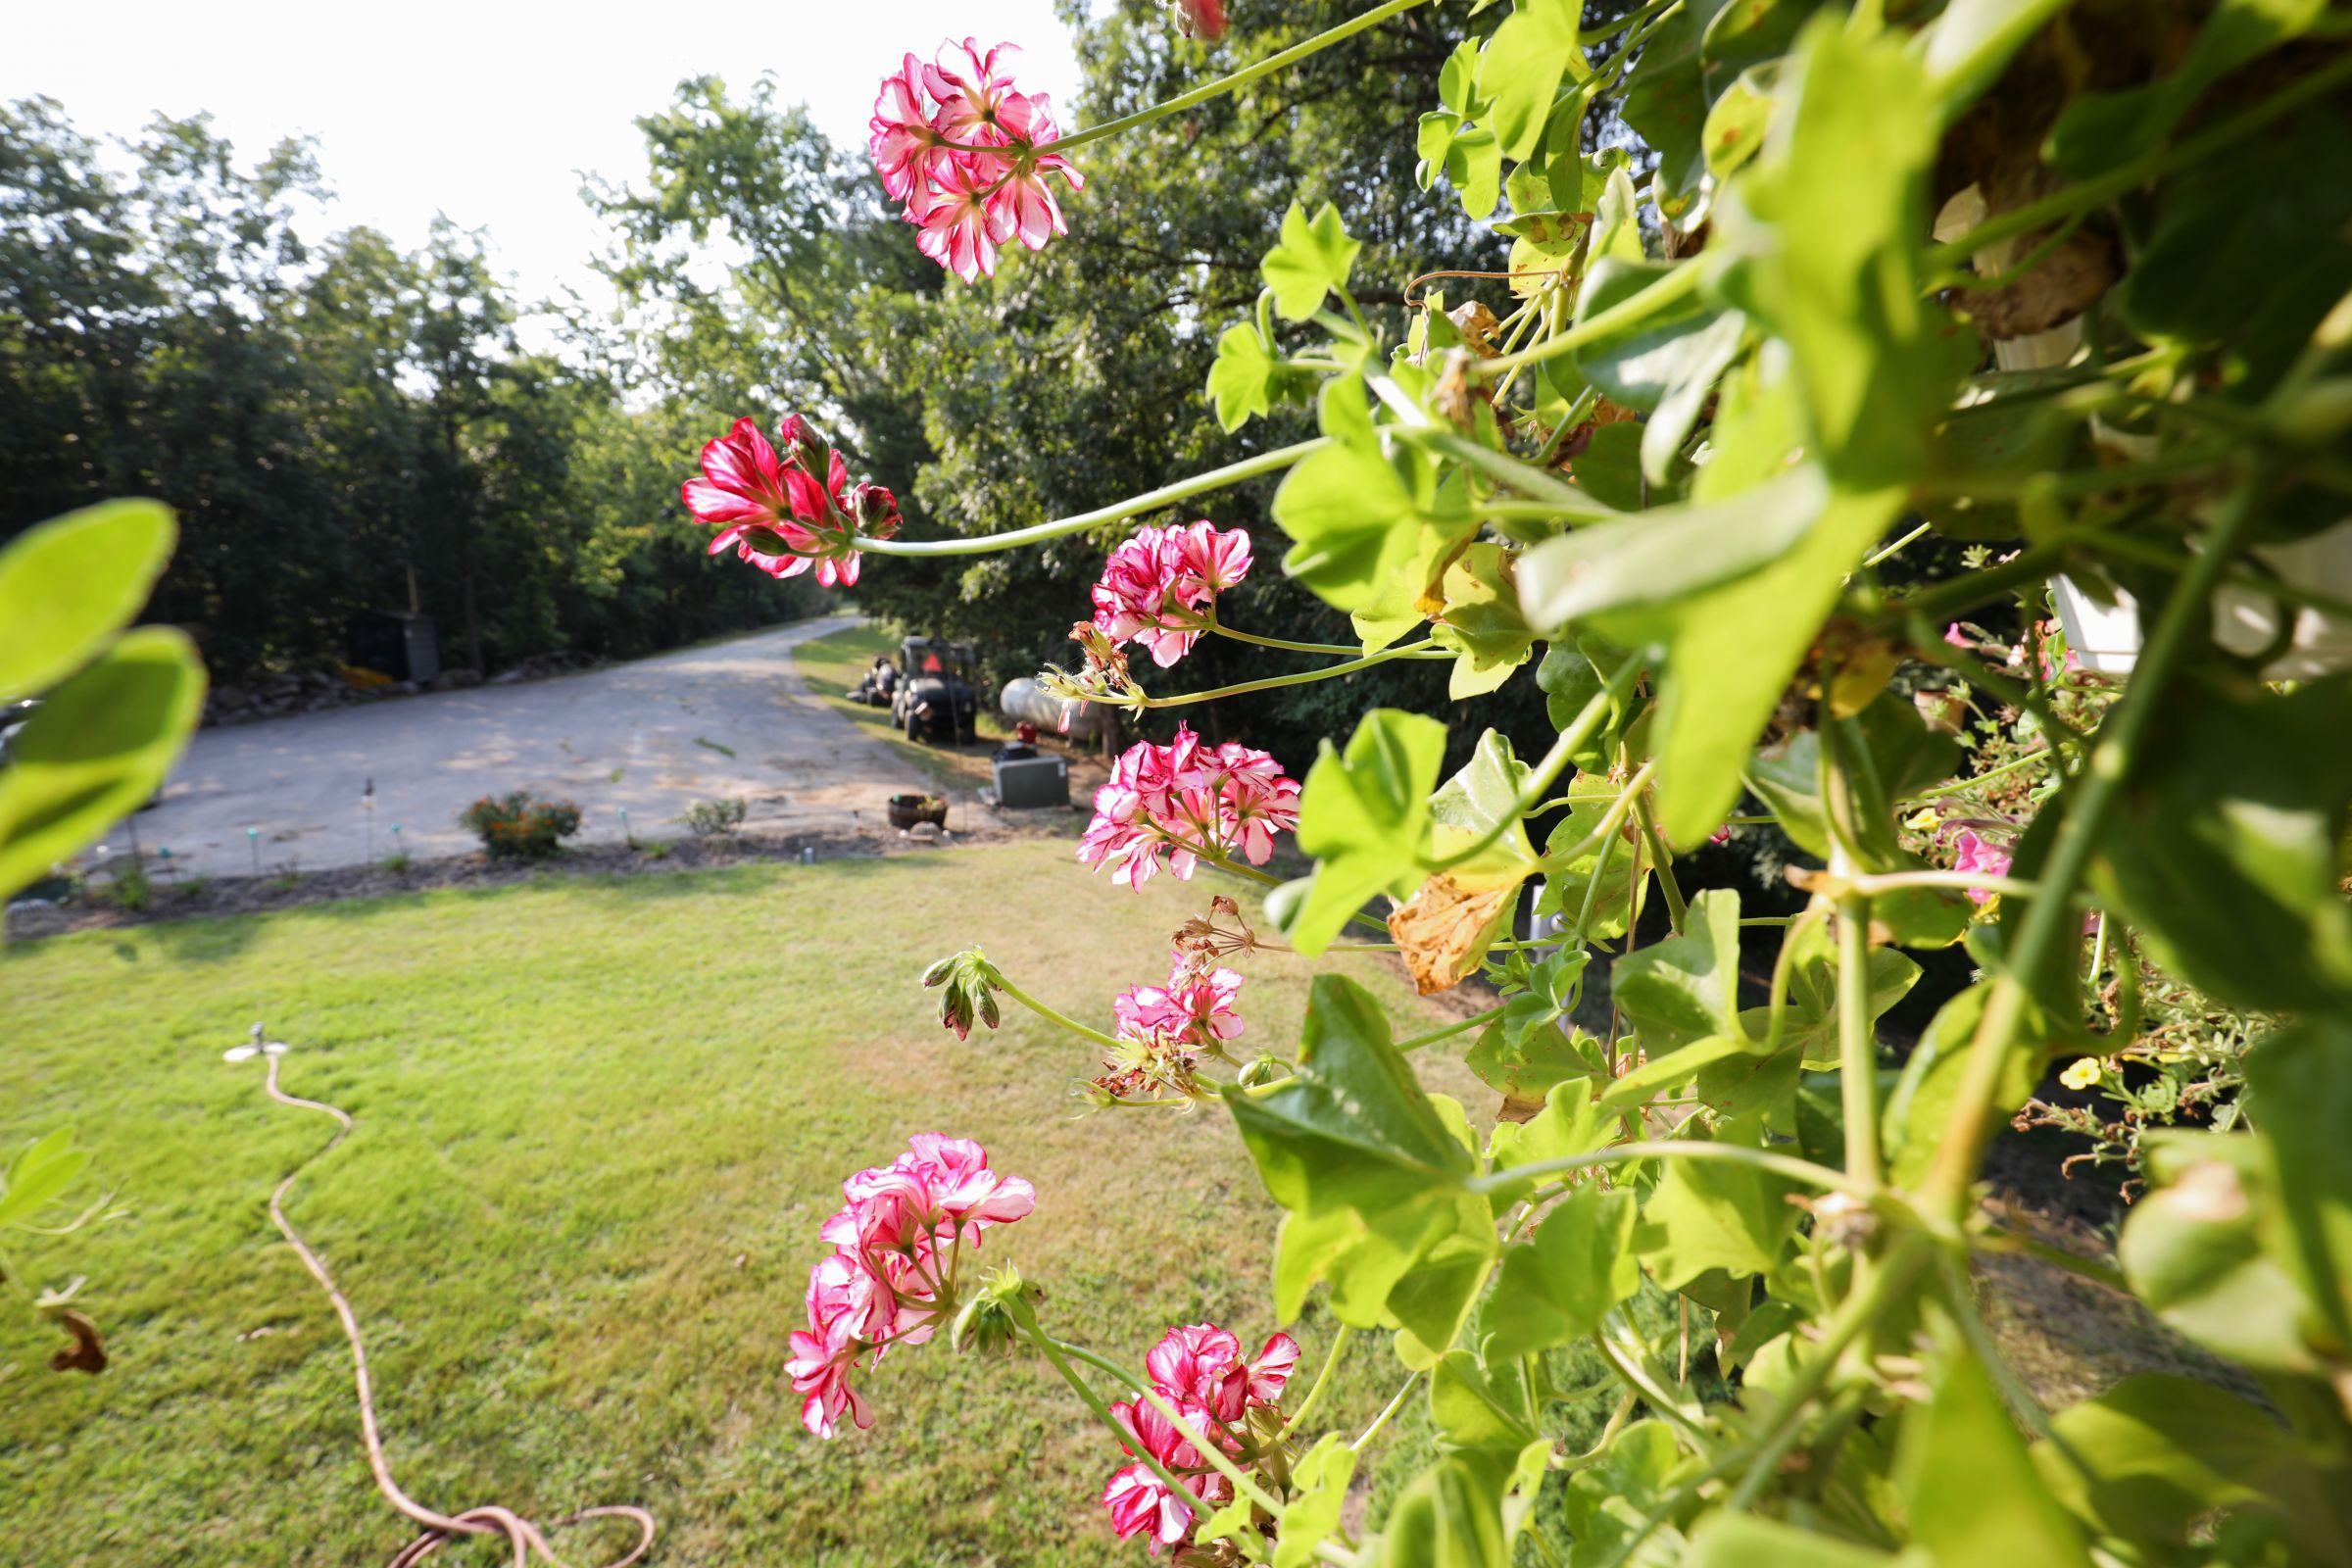 land-lee-county-iowa-328-acres-listing-number-15137-10-2020-08-27-174709.jpg